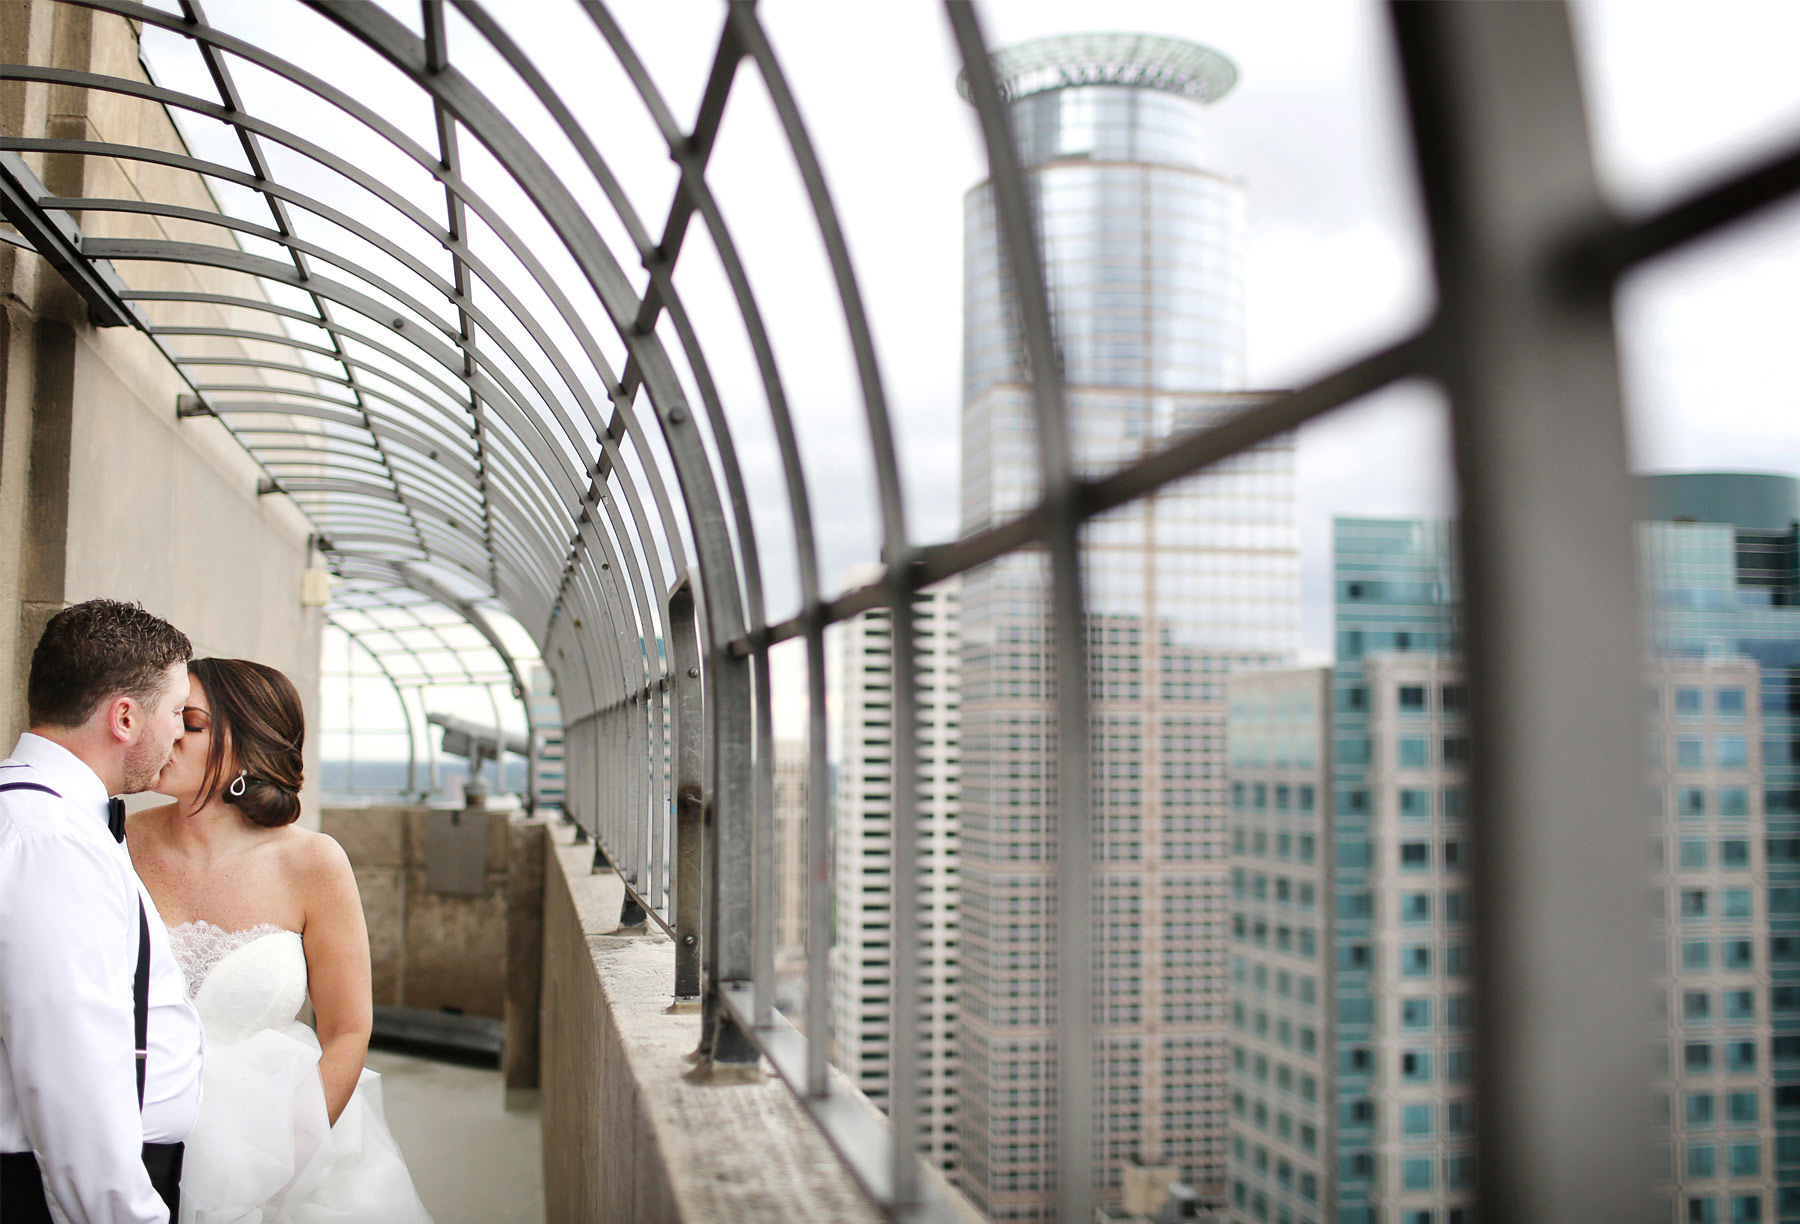 04-Minneapolis-Minnesota-Wedding-Photography-by-Vick-Photography-Downtown-Foshay-Skyline-Megan-and-Andrew.jpg